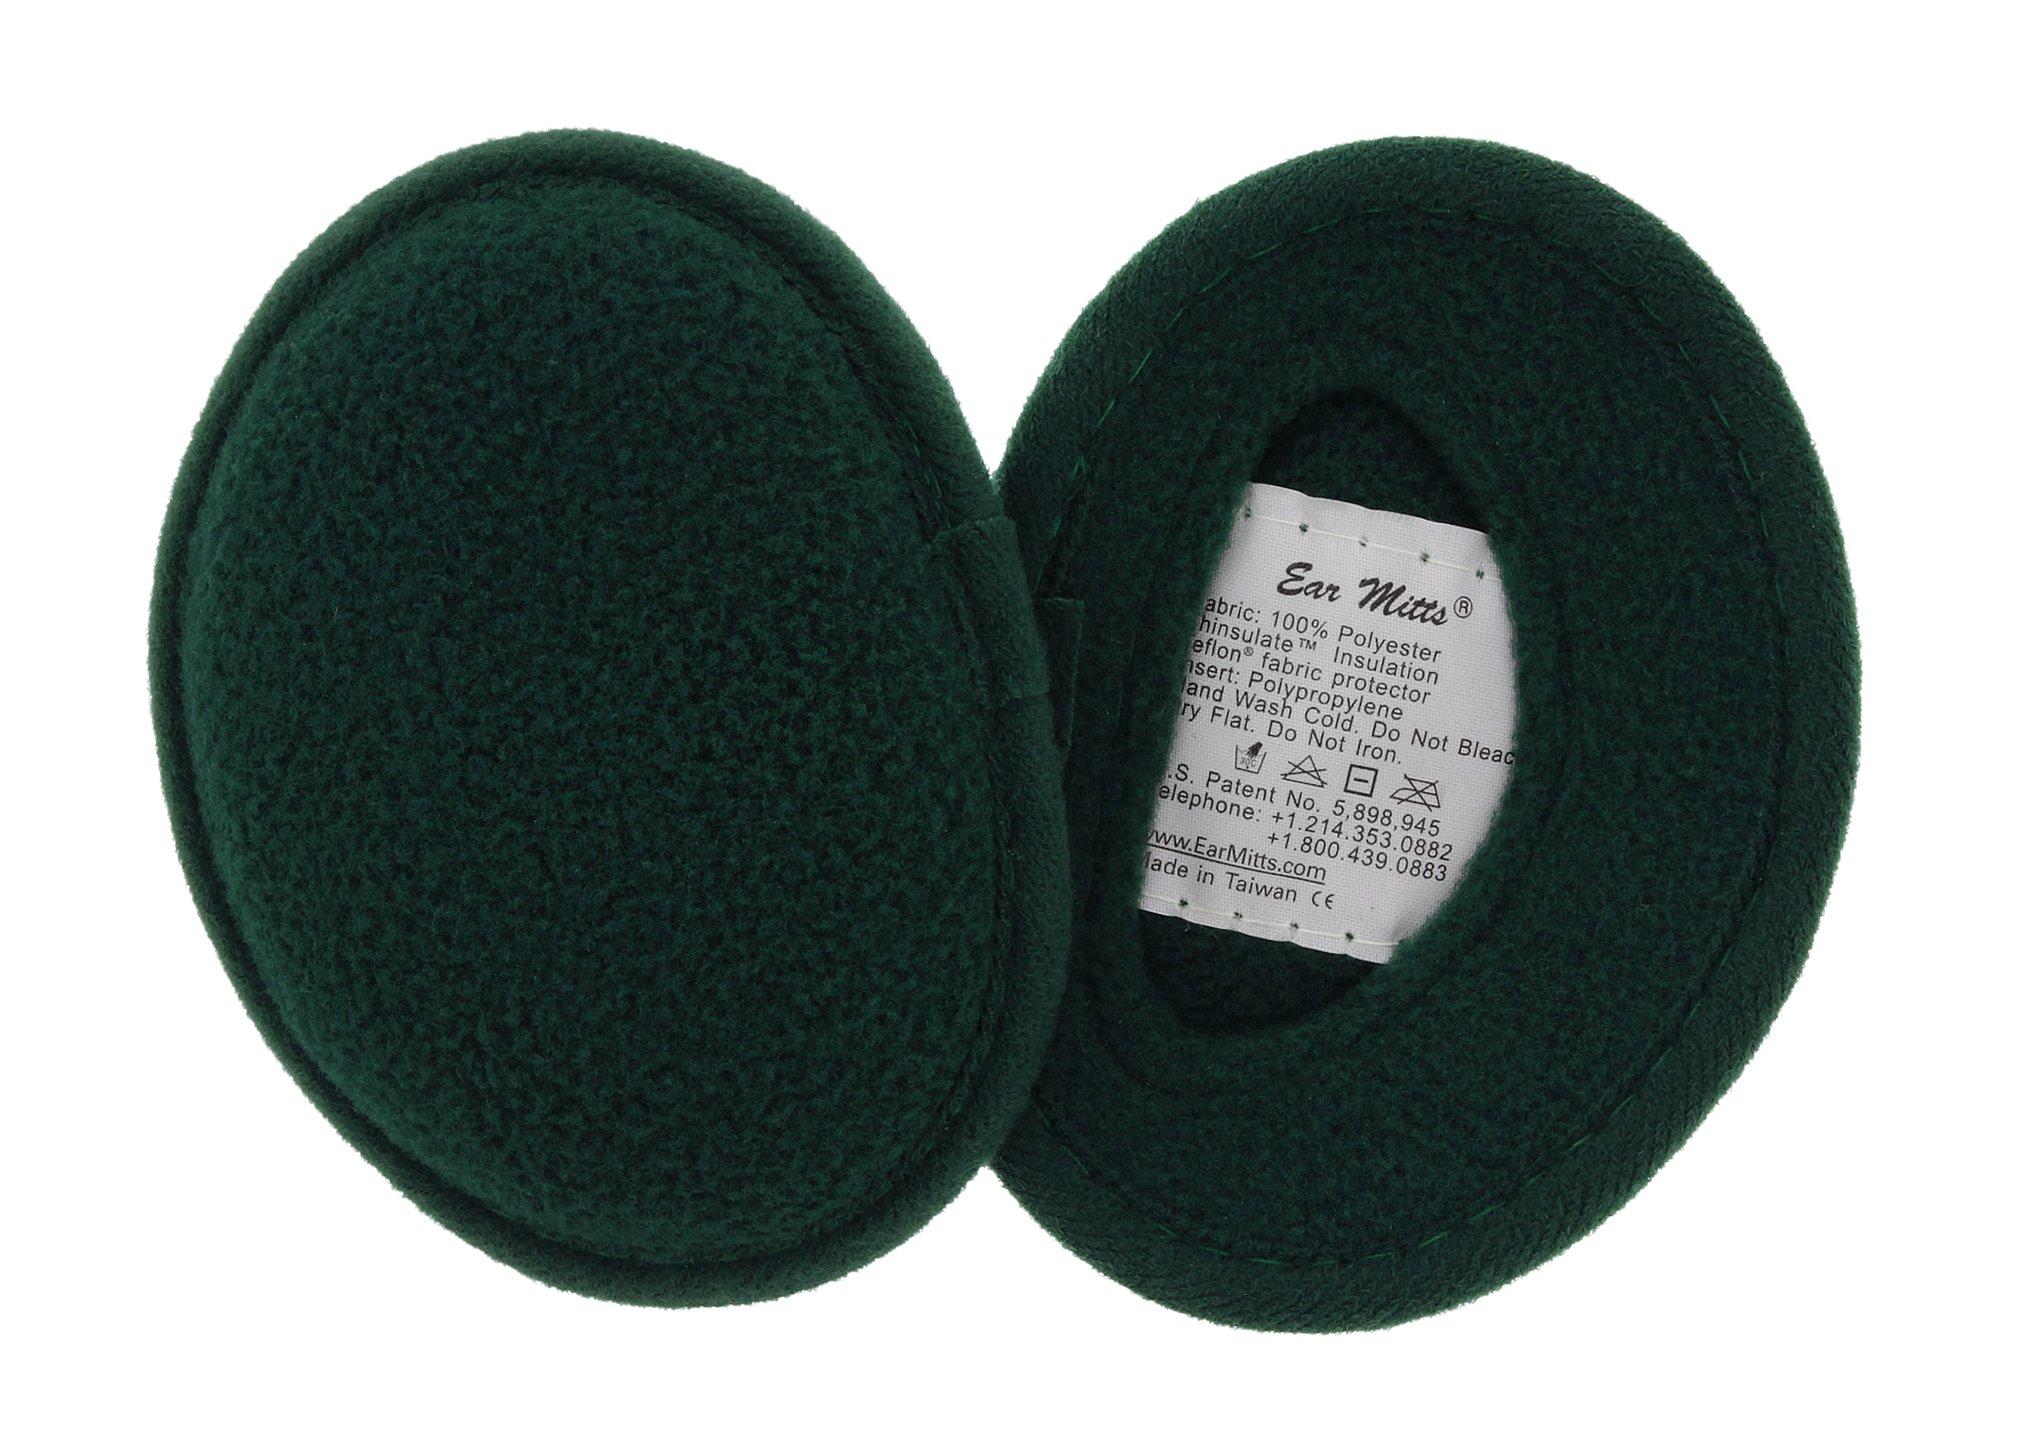 Ear Mitts Bandless Ear Muffs For Men, Hunter Green Fleece Ear Warmers, Small by Ear Mitts